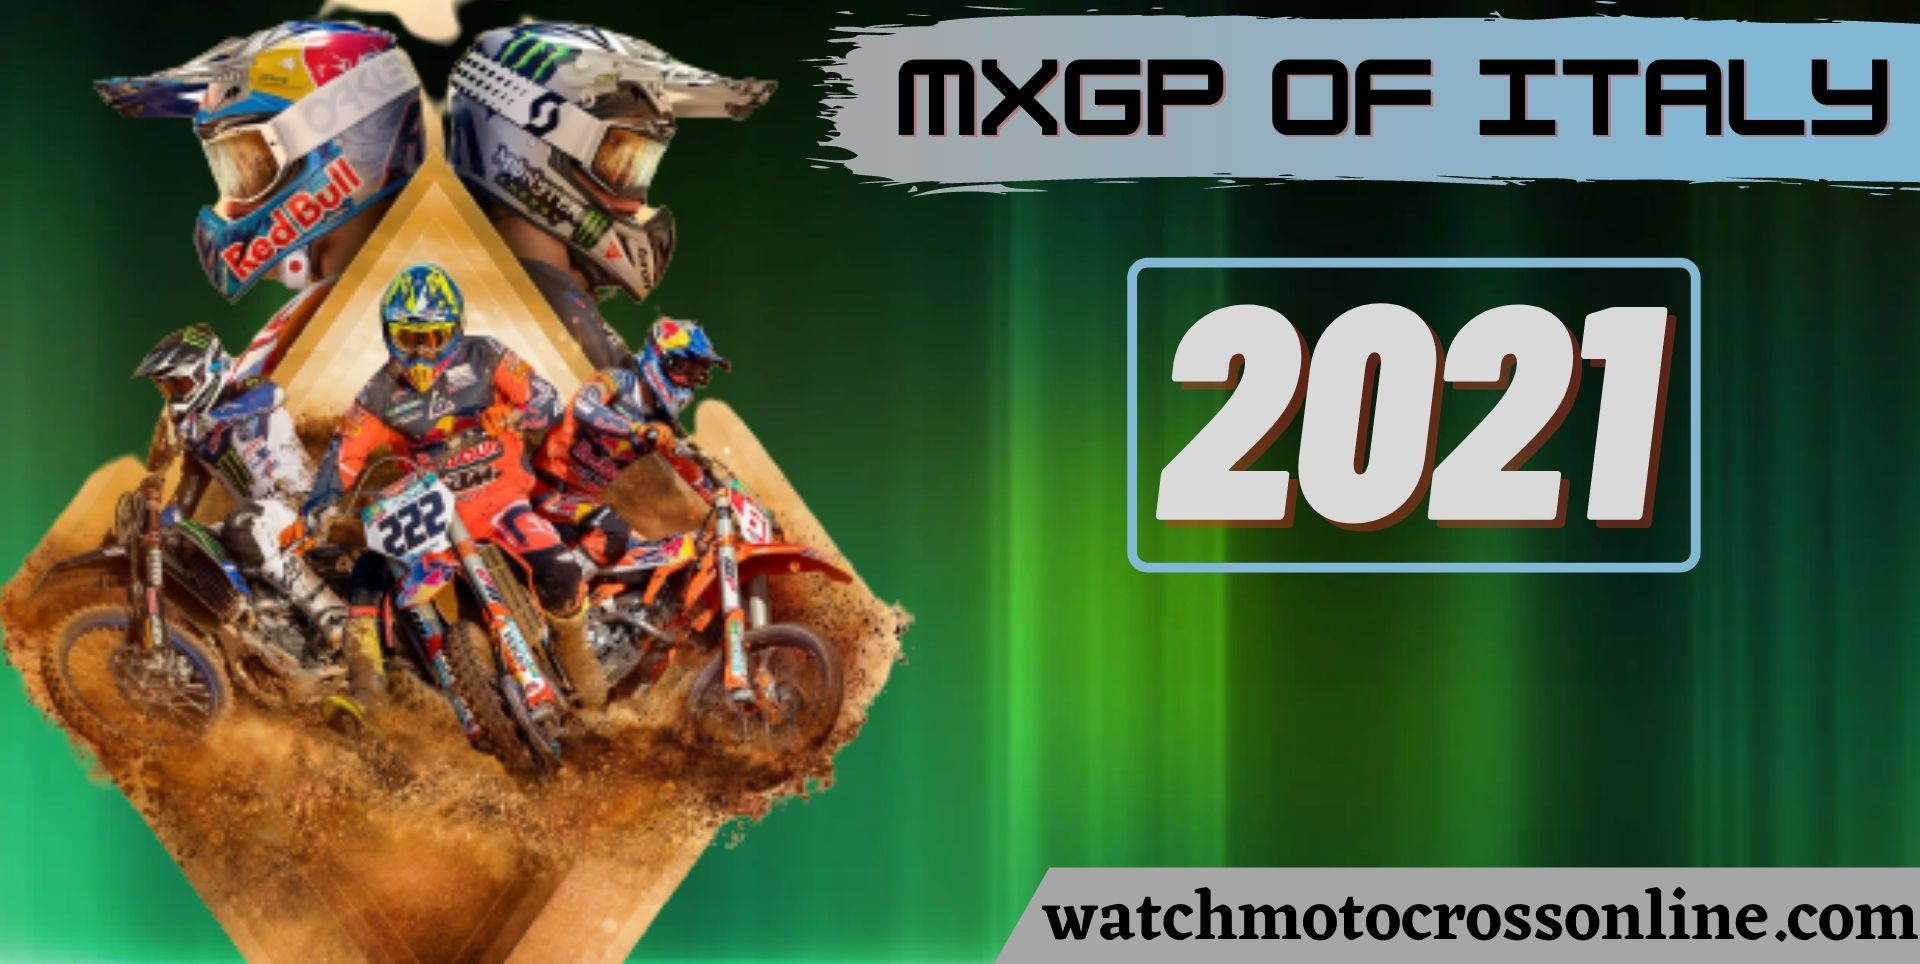 MXGP Of Italy Live Stream 2021